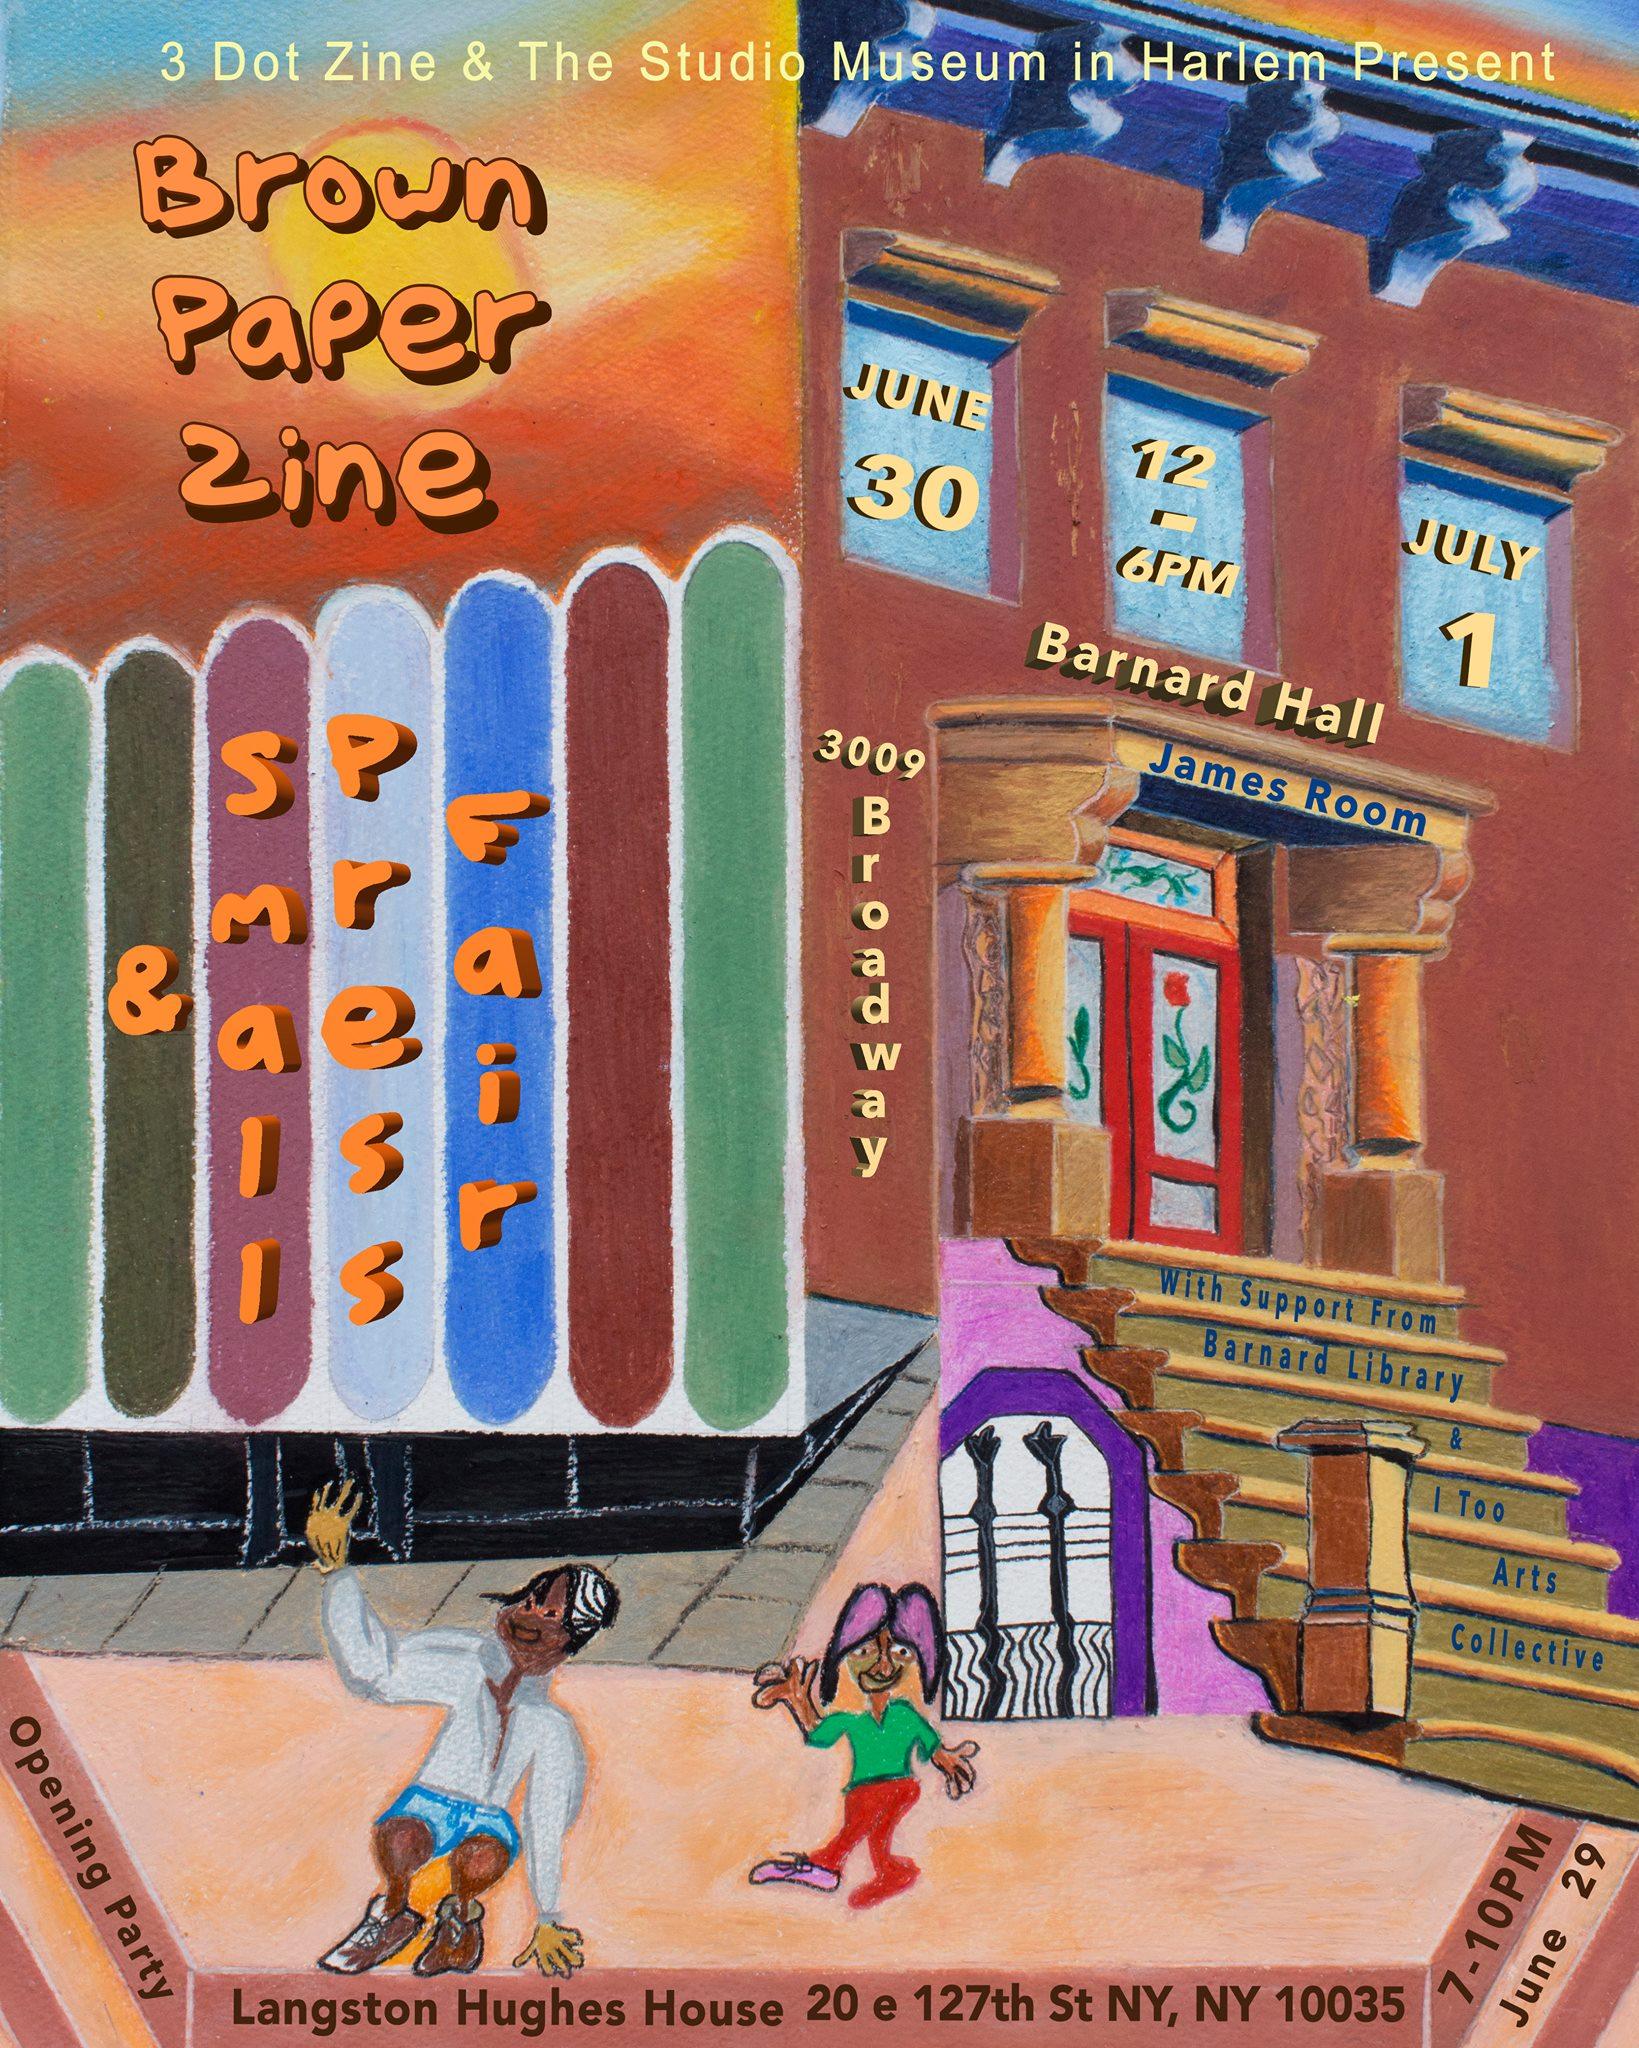 Brown Paper Zine & Small Press Fair - 2018